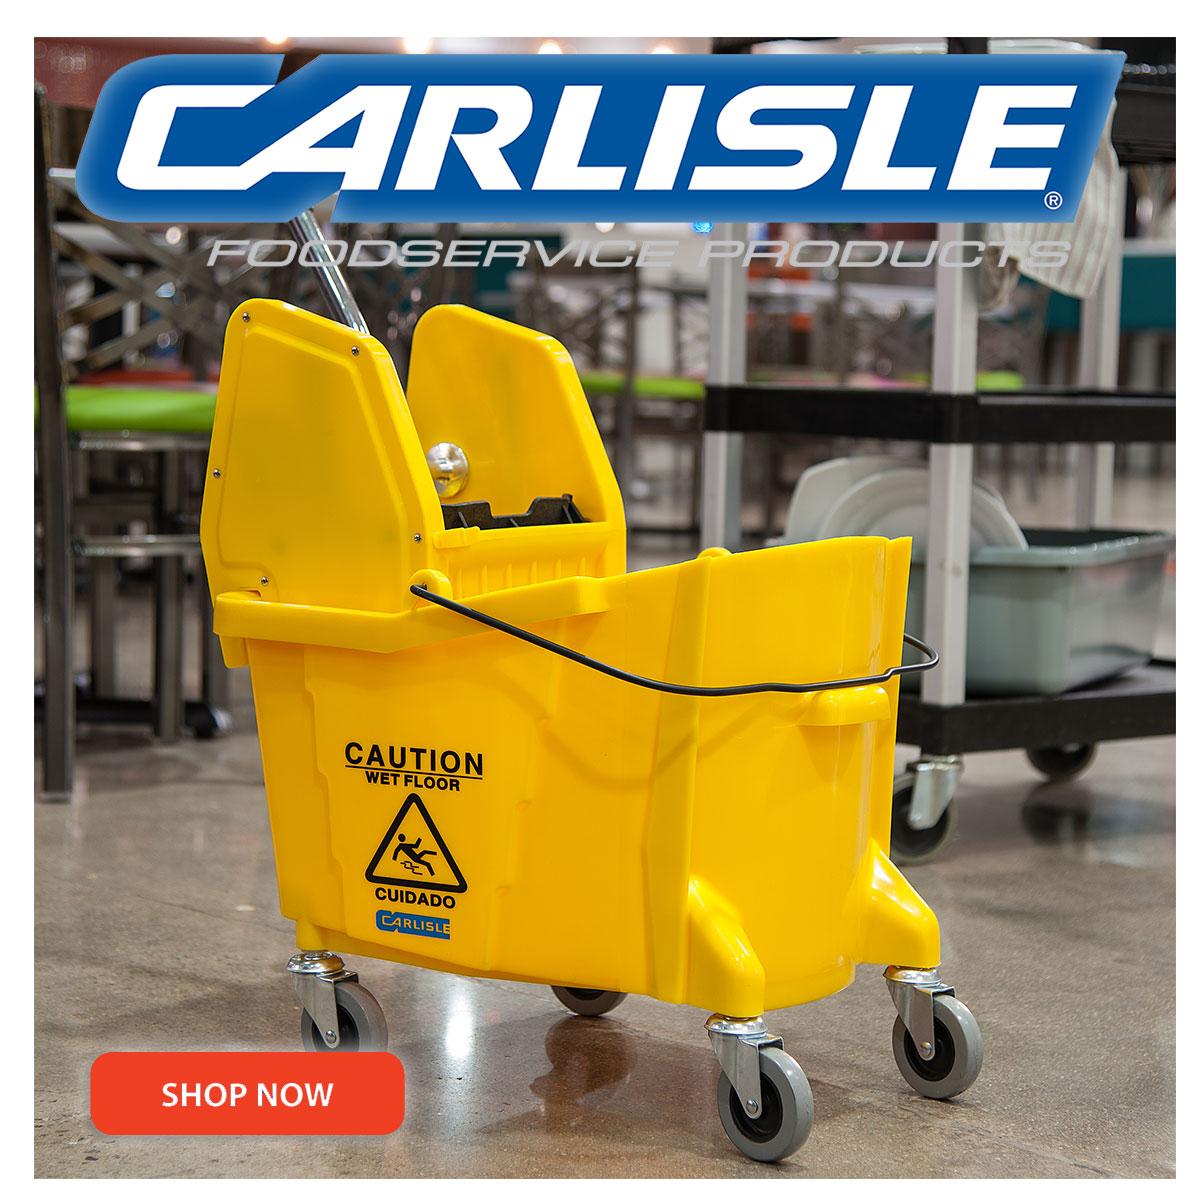 Carlisle is the leading manufacturer in plastic dinnerware, drinkware, and sanitation.